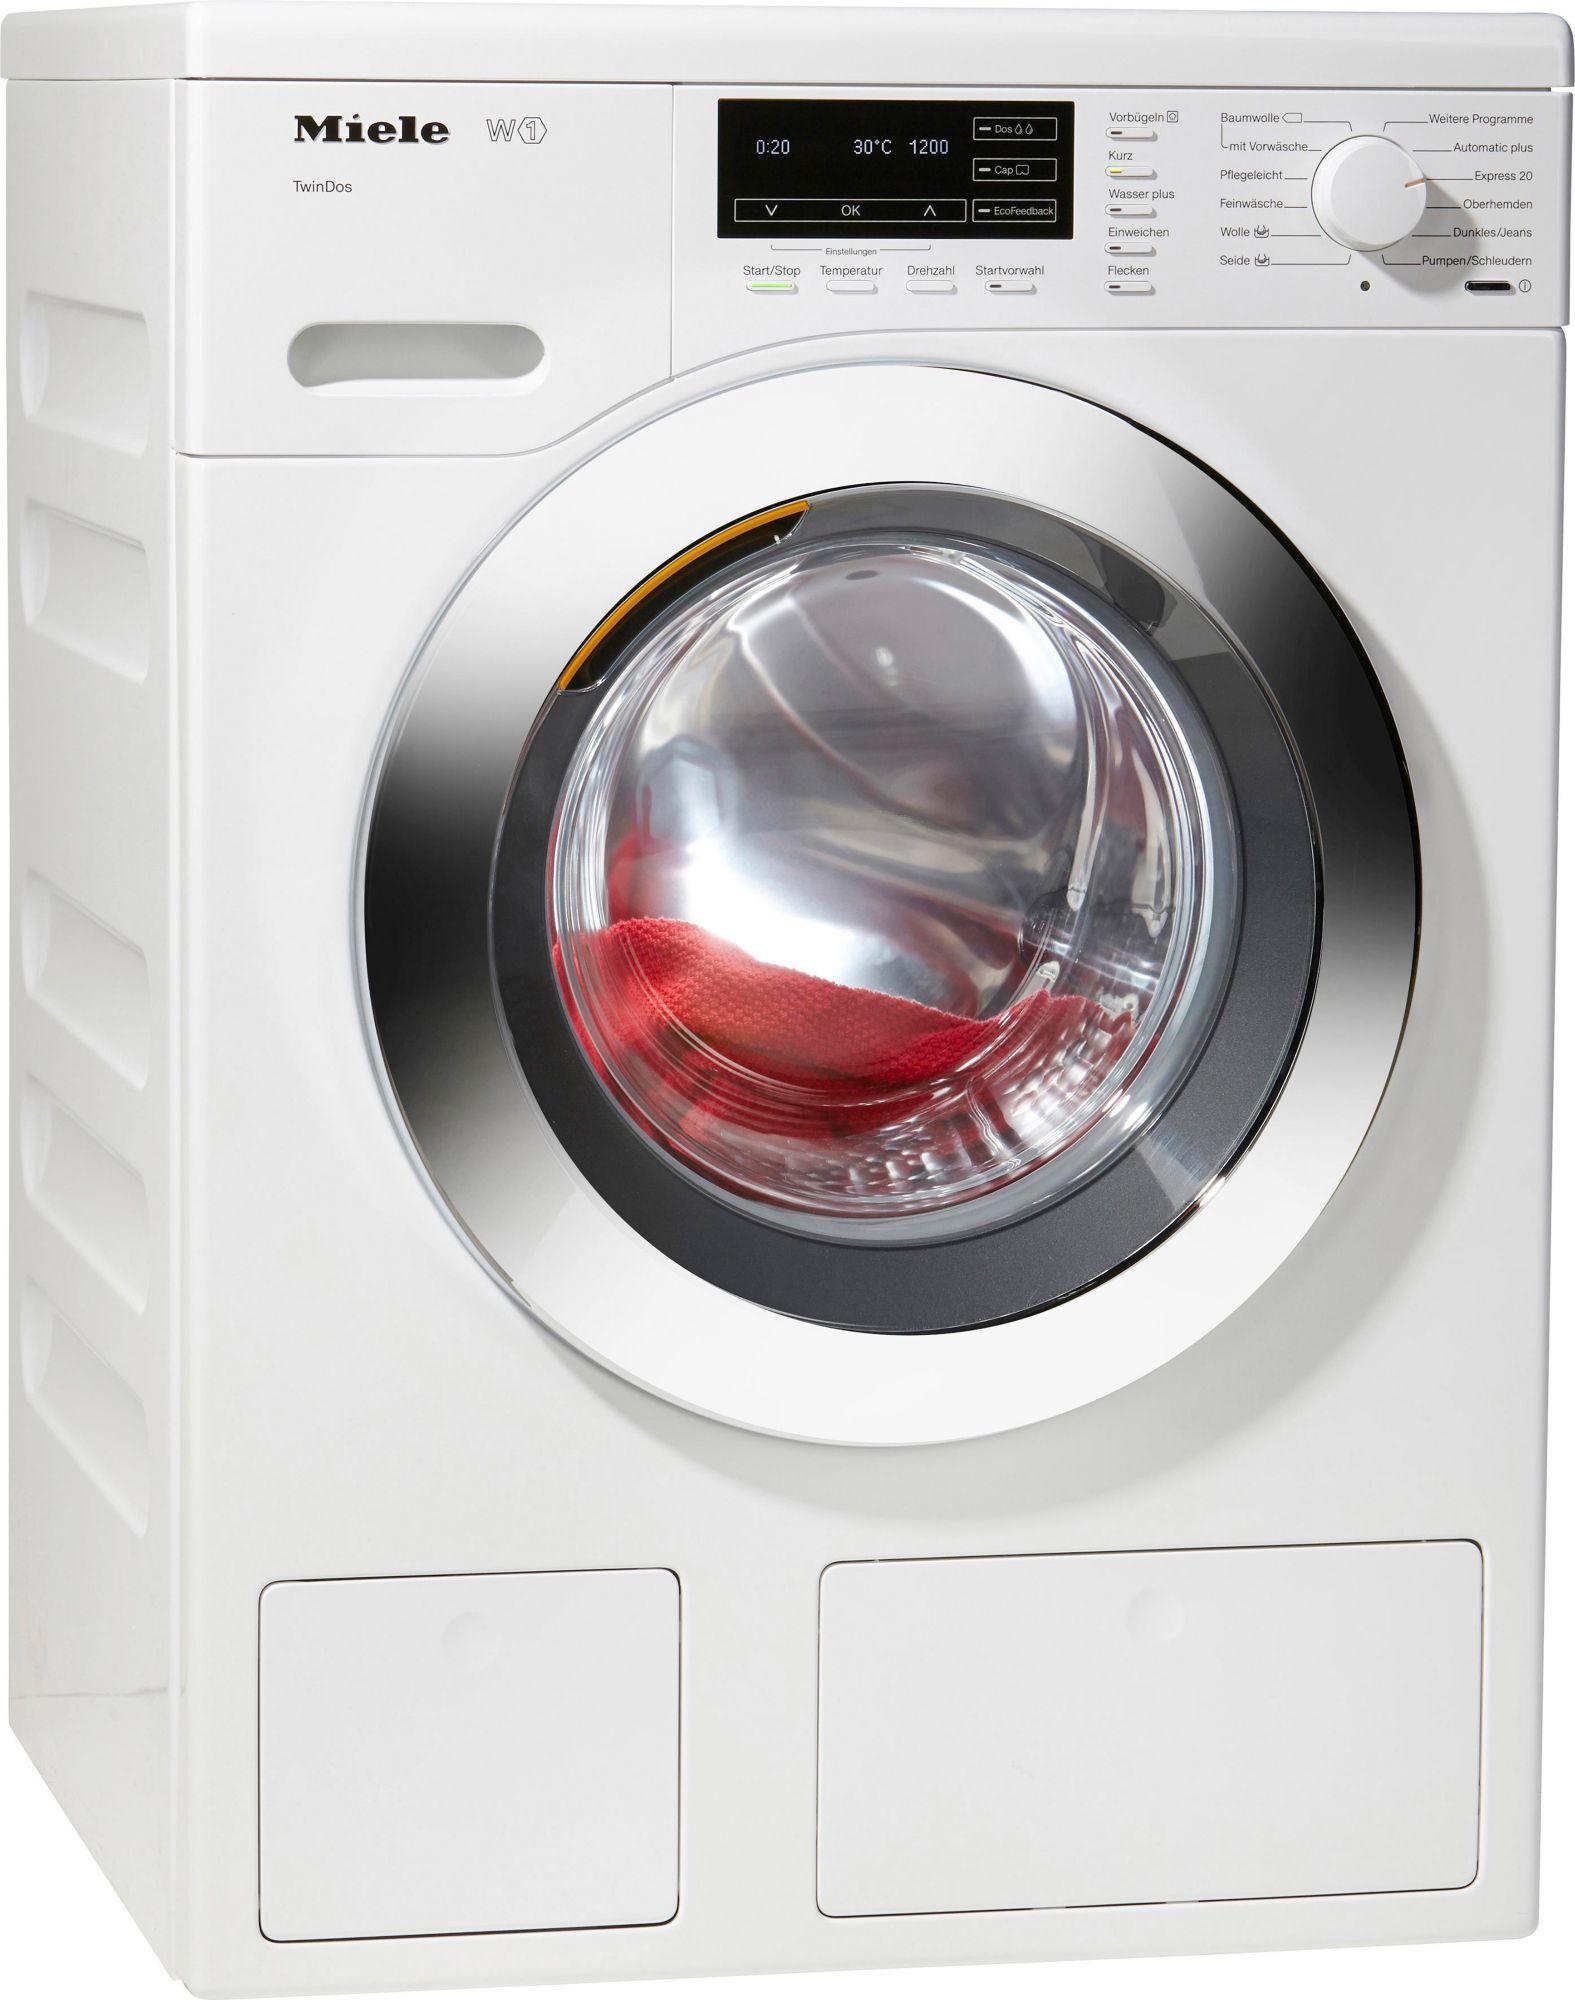 miele waschmaschine wkg 120 wps a 8 kg 1600 u min. Black Bedroom Furniture Sets. Home Design Ideas